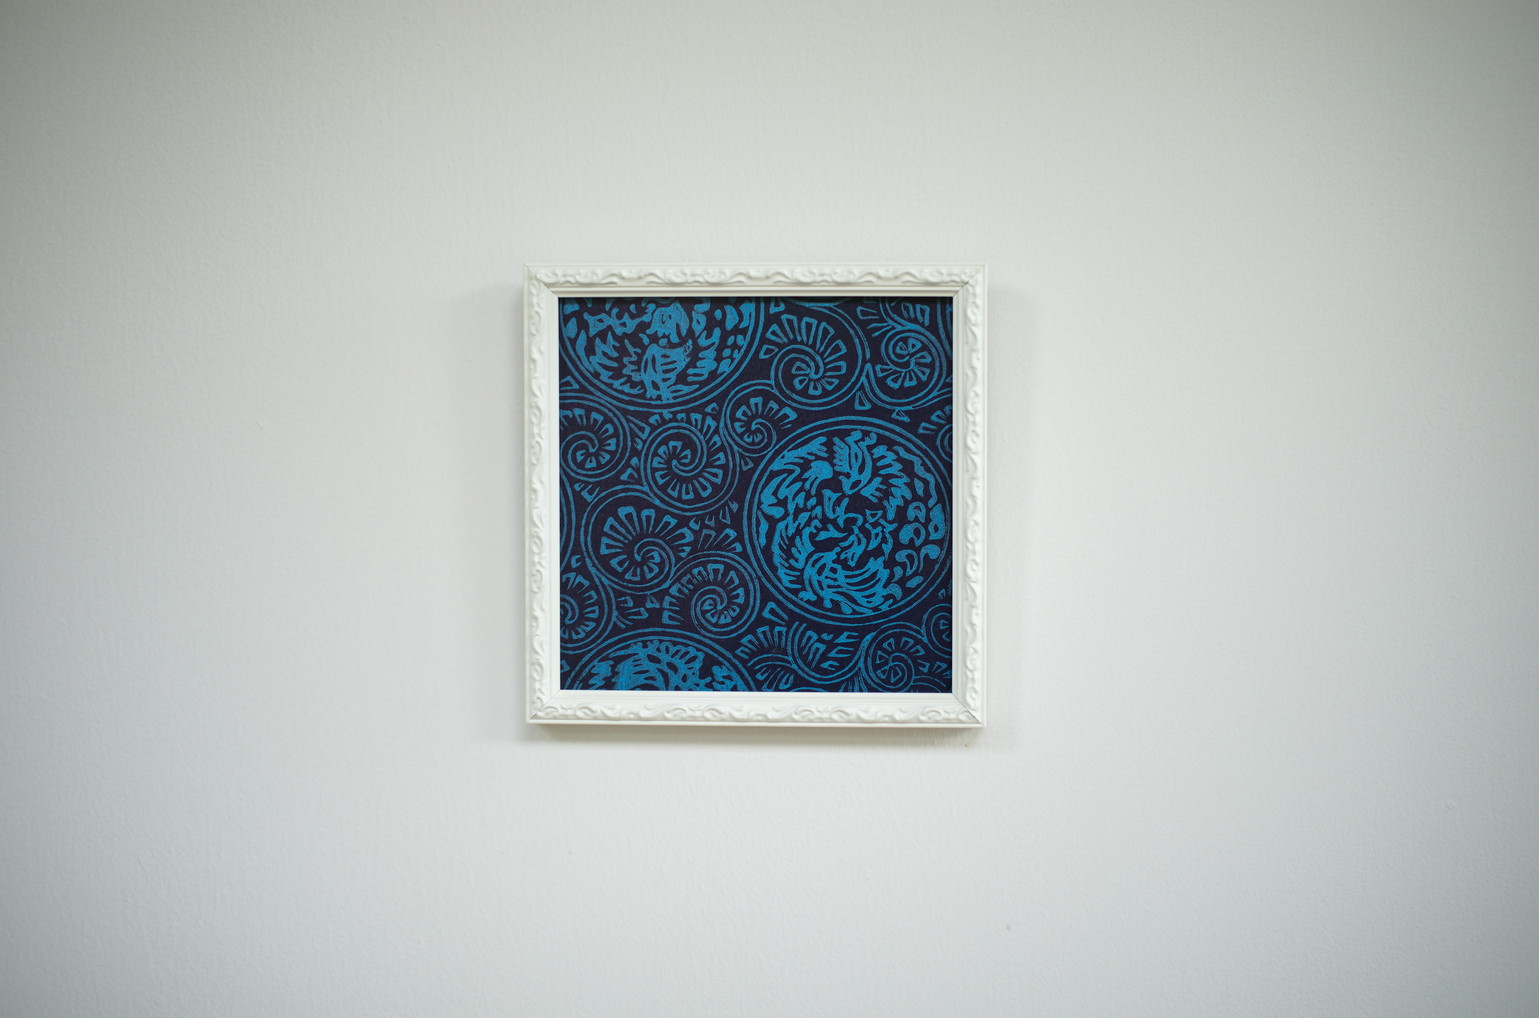 kira額(アートパネル)/鳳凰丸唐草(0113)